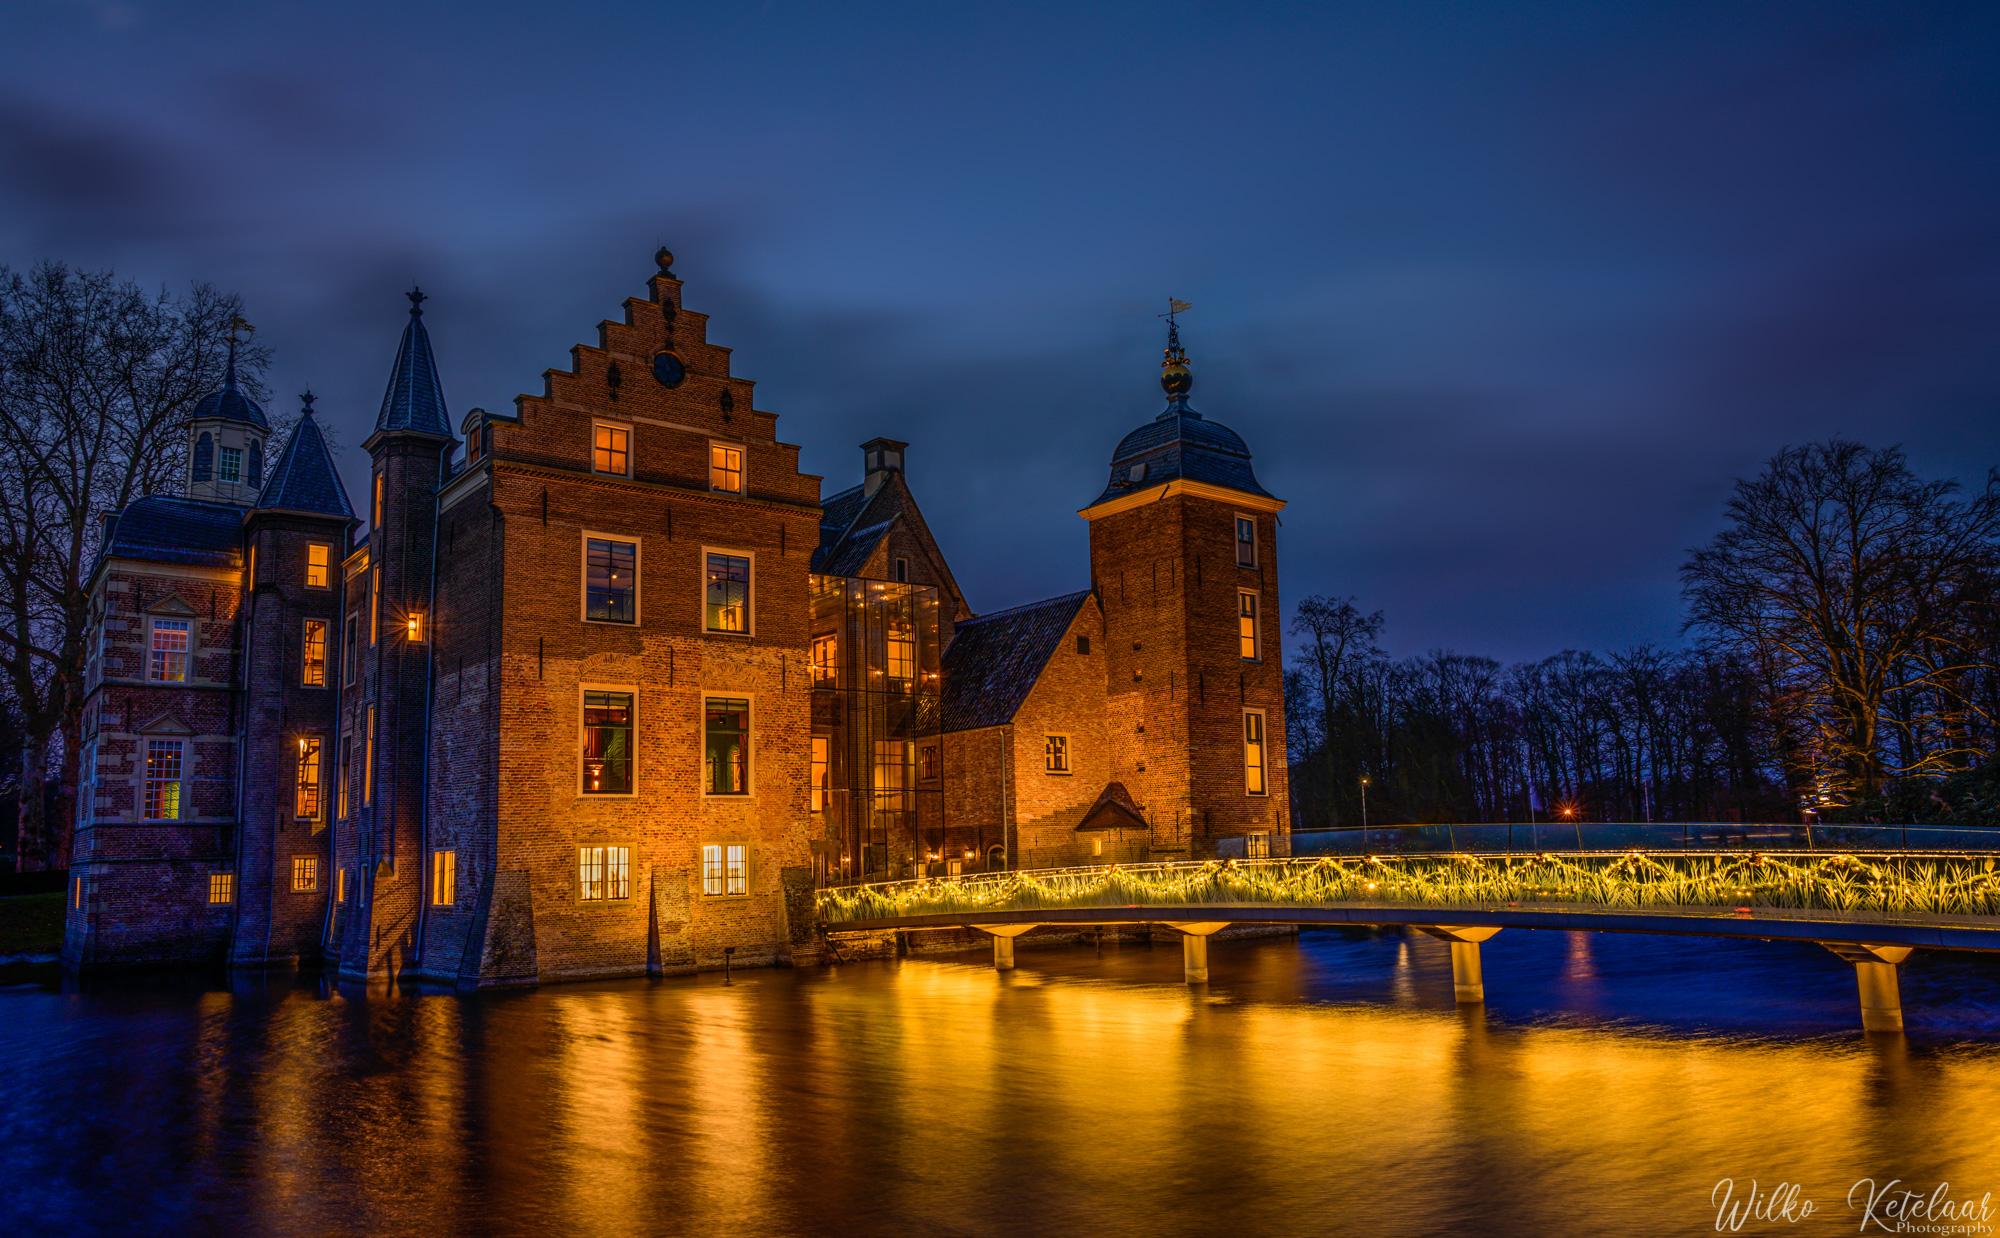 Castle Ruurlo, Netherlands